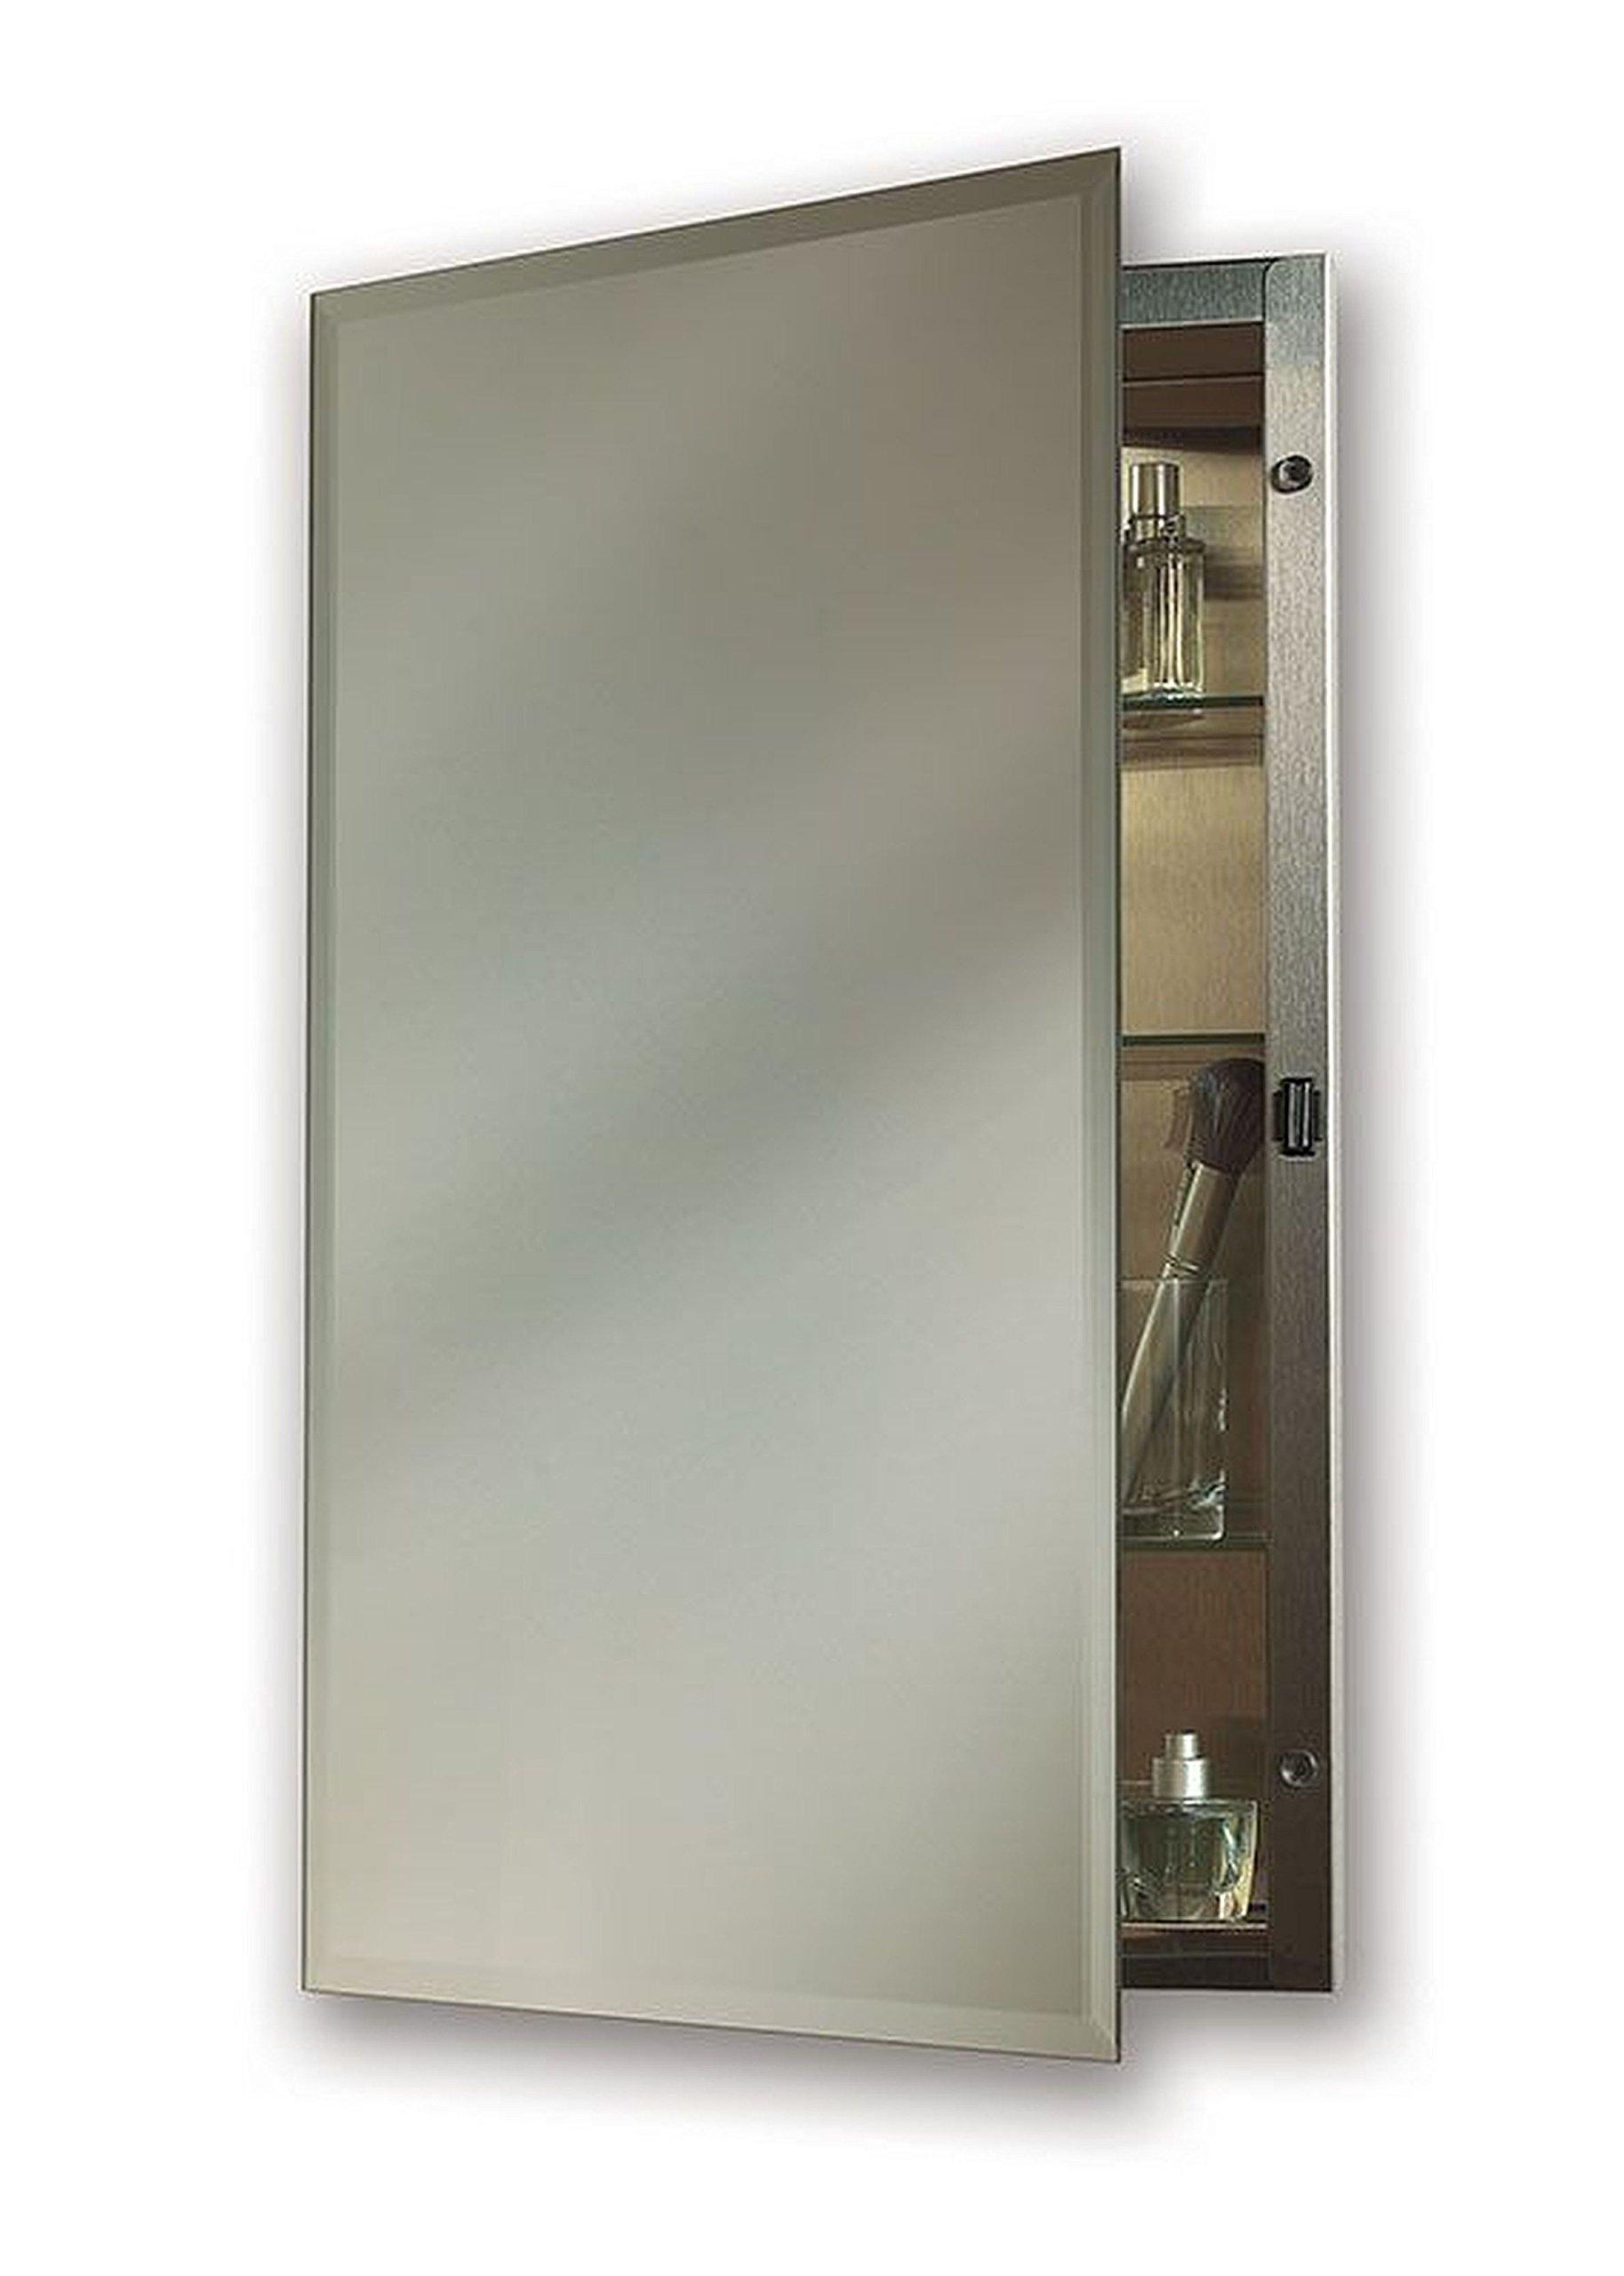 Amazon Com Jensen 1447x Bevel Mirror Medicine Cabinet 16 X 20 Stainless Steel Home Improvement